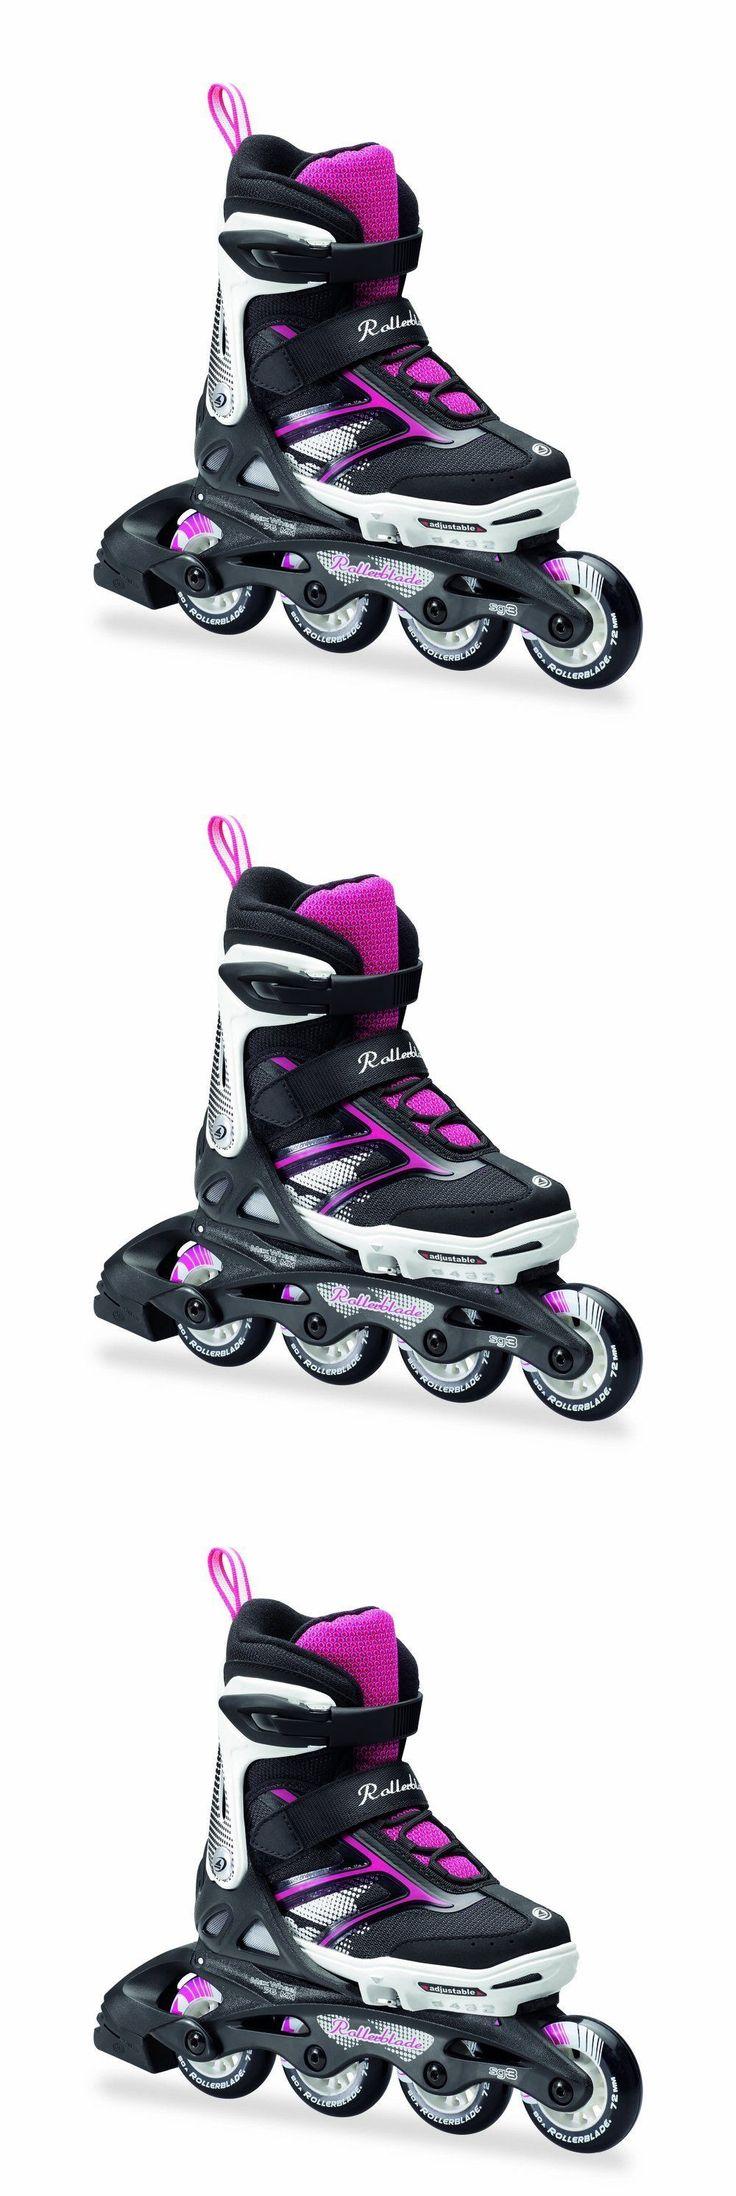 Roller skating lancaster pa - Youth 47345 Durable Girls High Quality Spitfire Kids Skates Rollerblades Black Pink Size 5